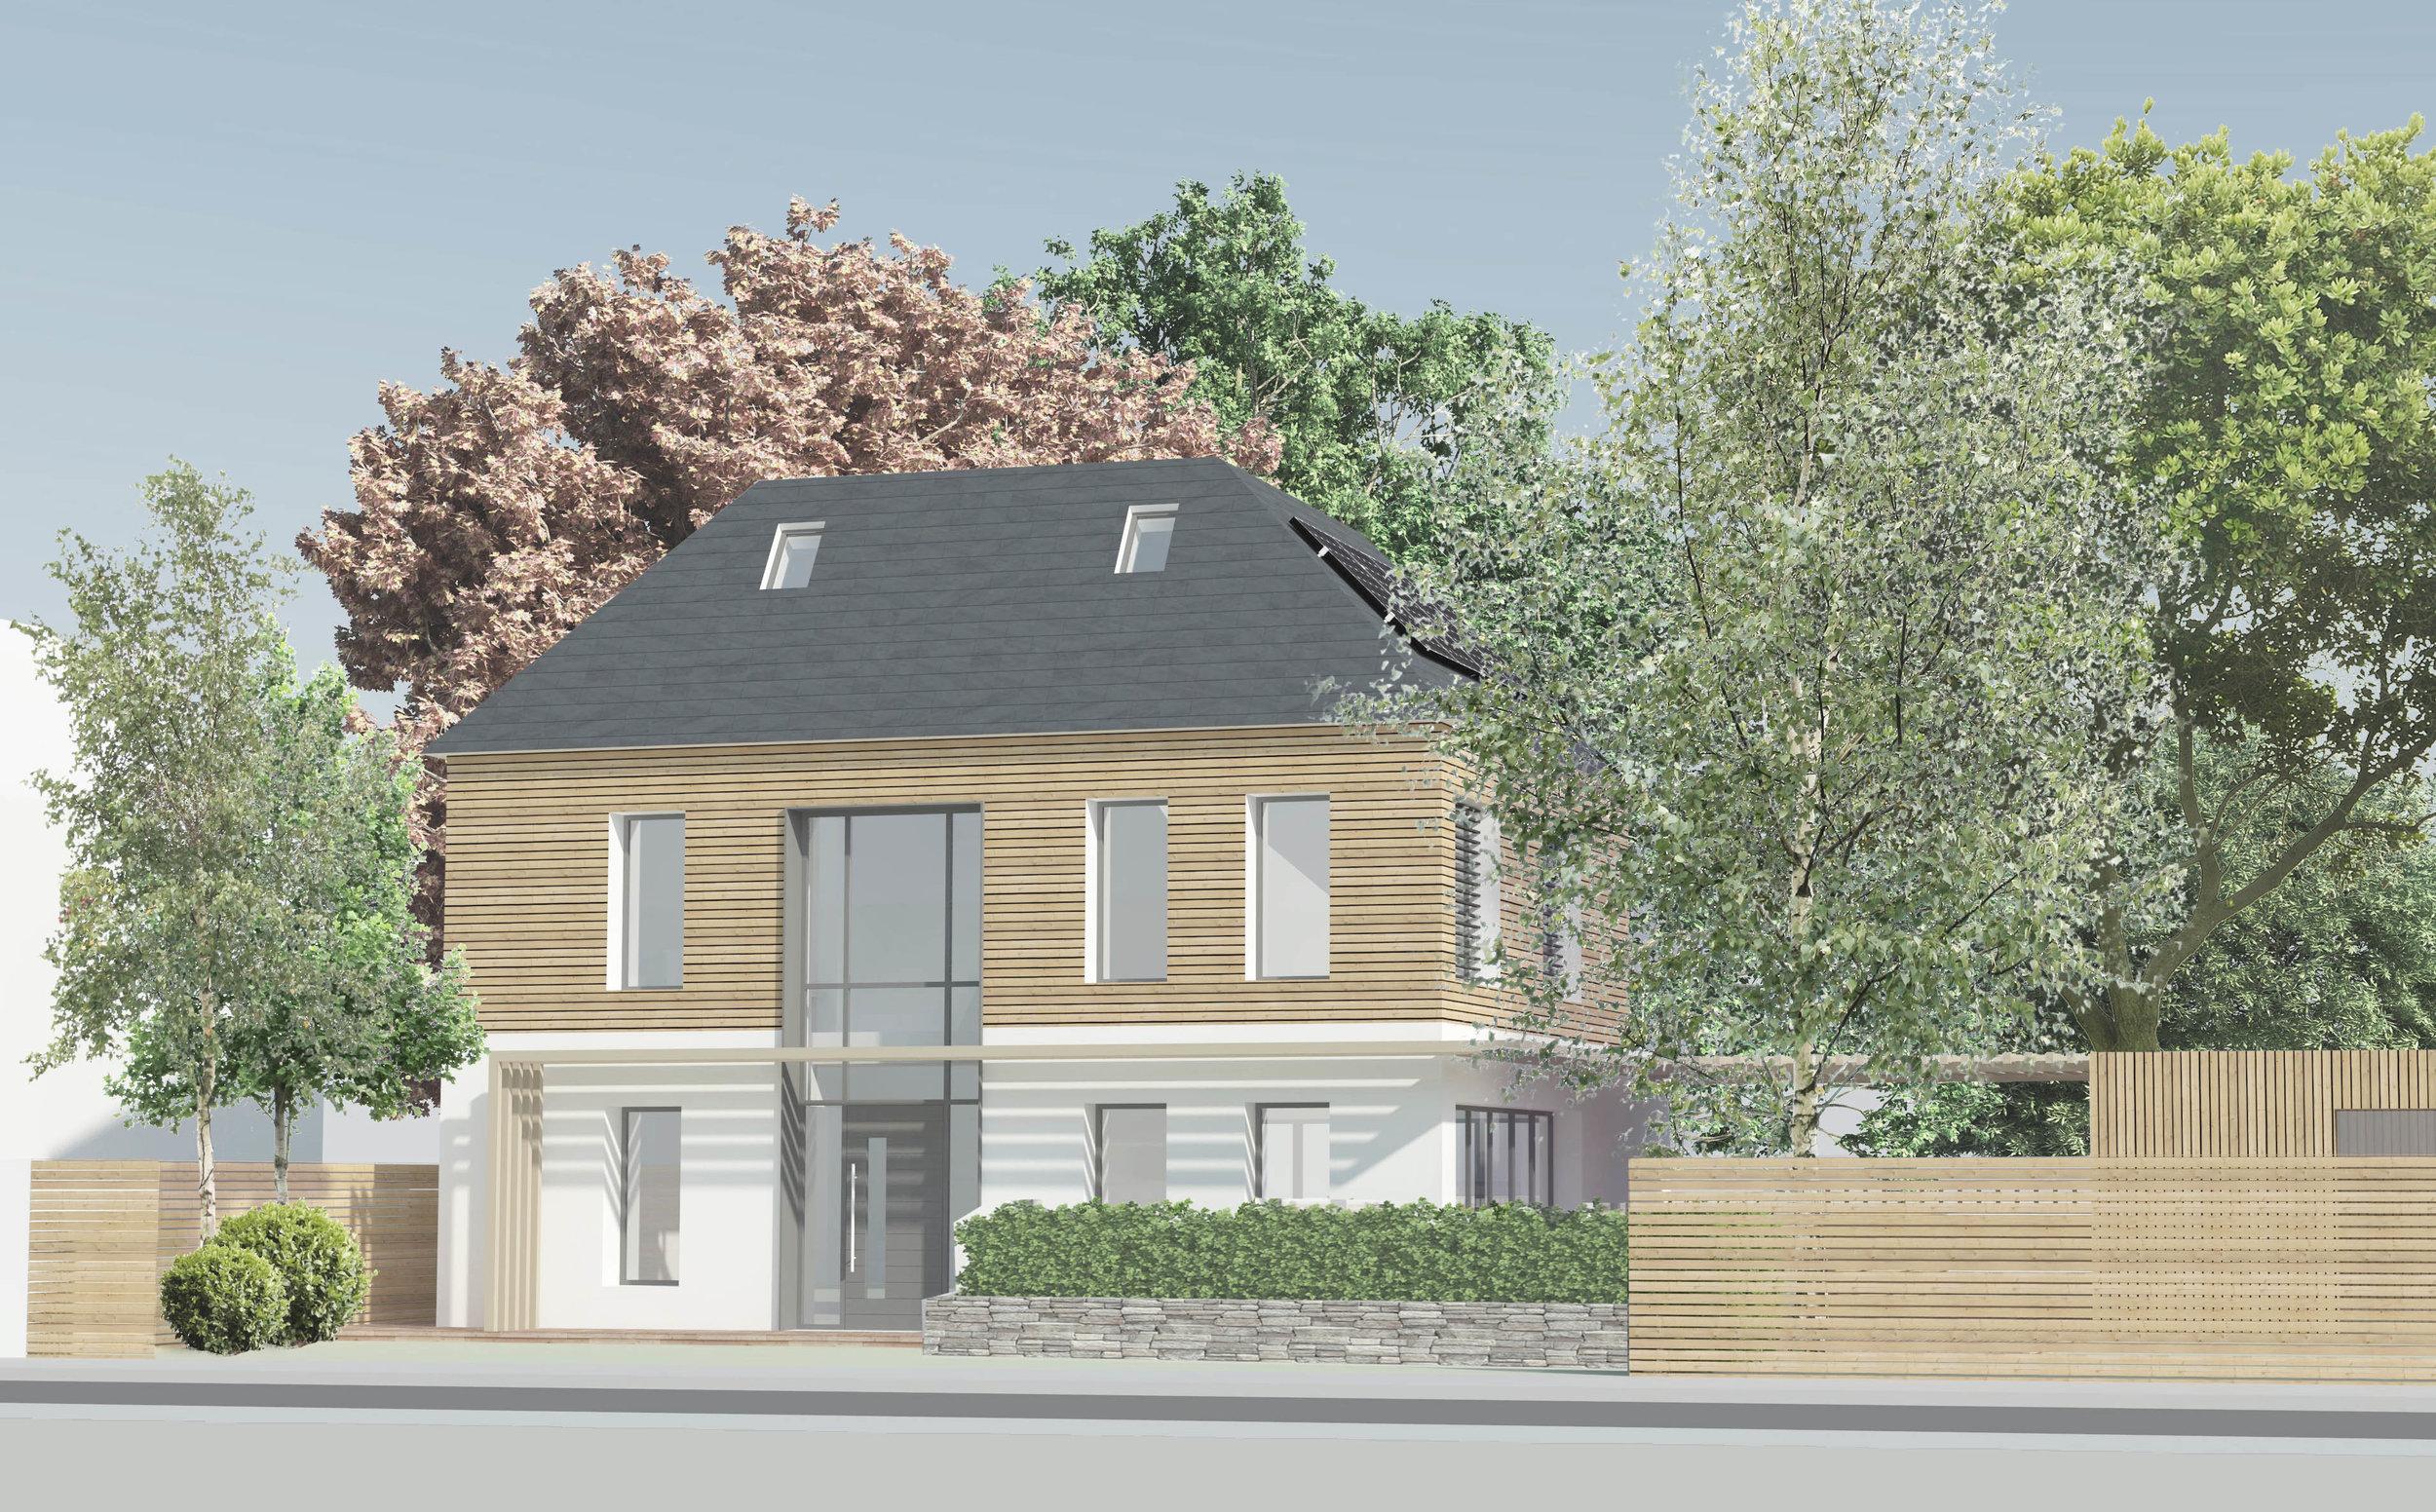 Mada Road Passivhaus    Location: Orpington   Floor Area: 230m2   Budget: £500,000   Client: Phil and Sam   View More